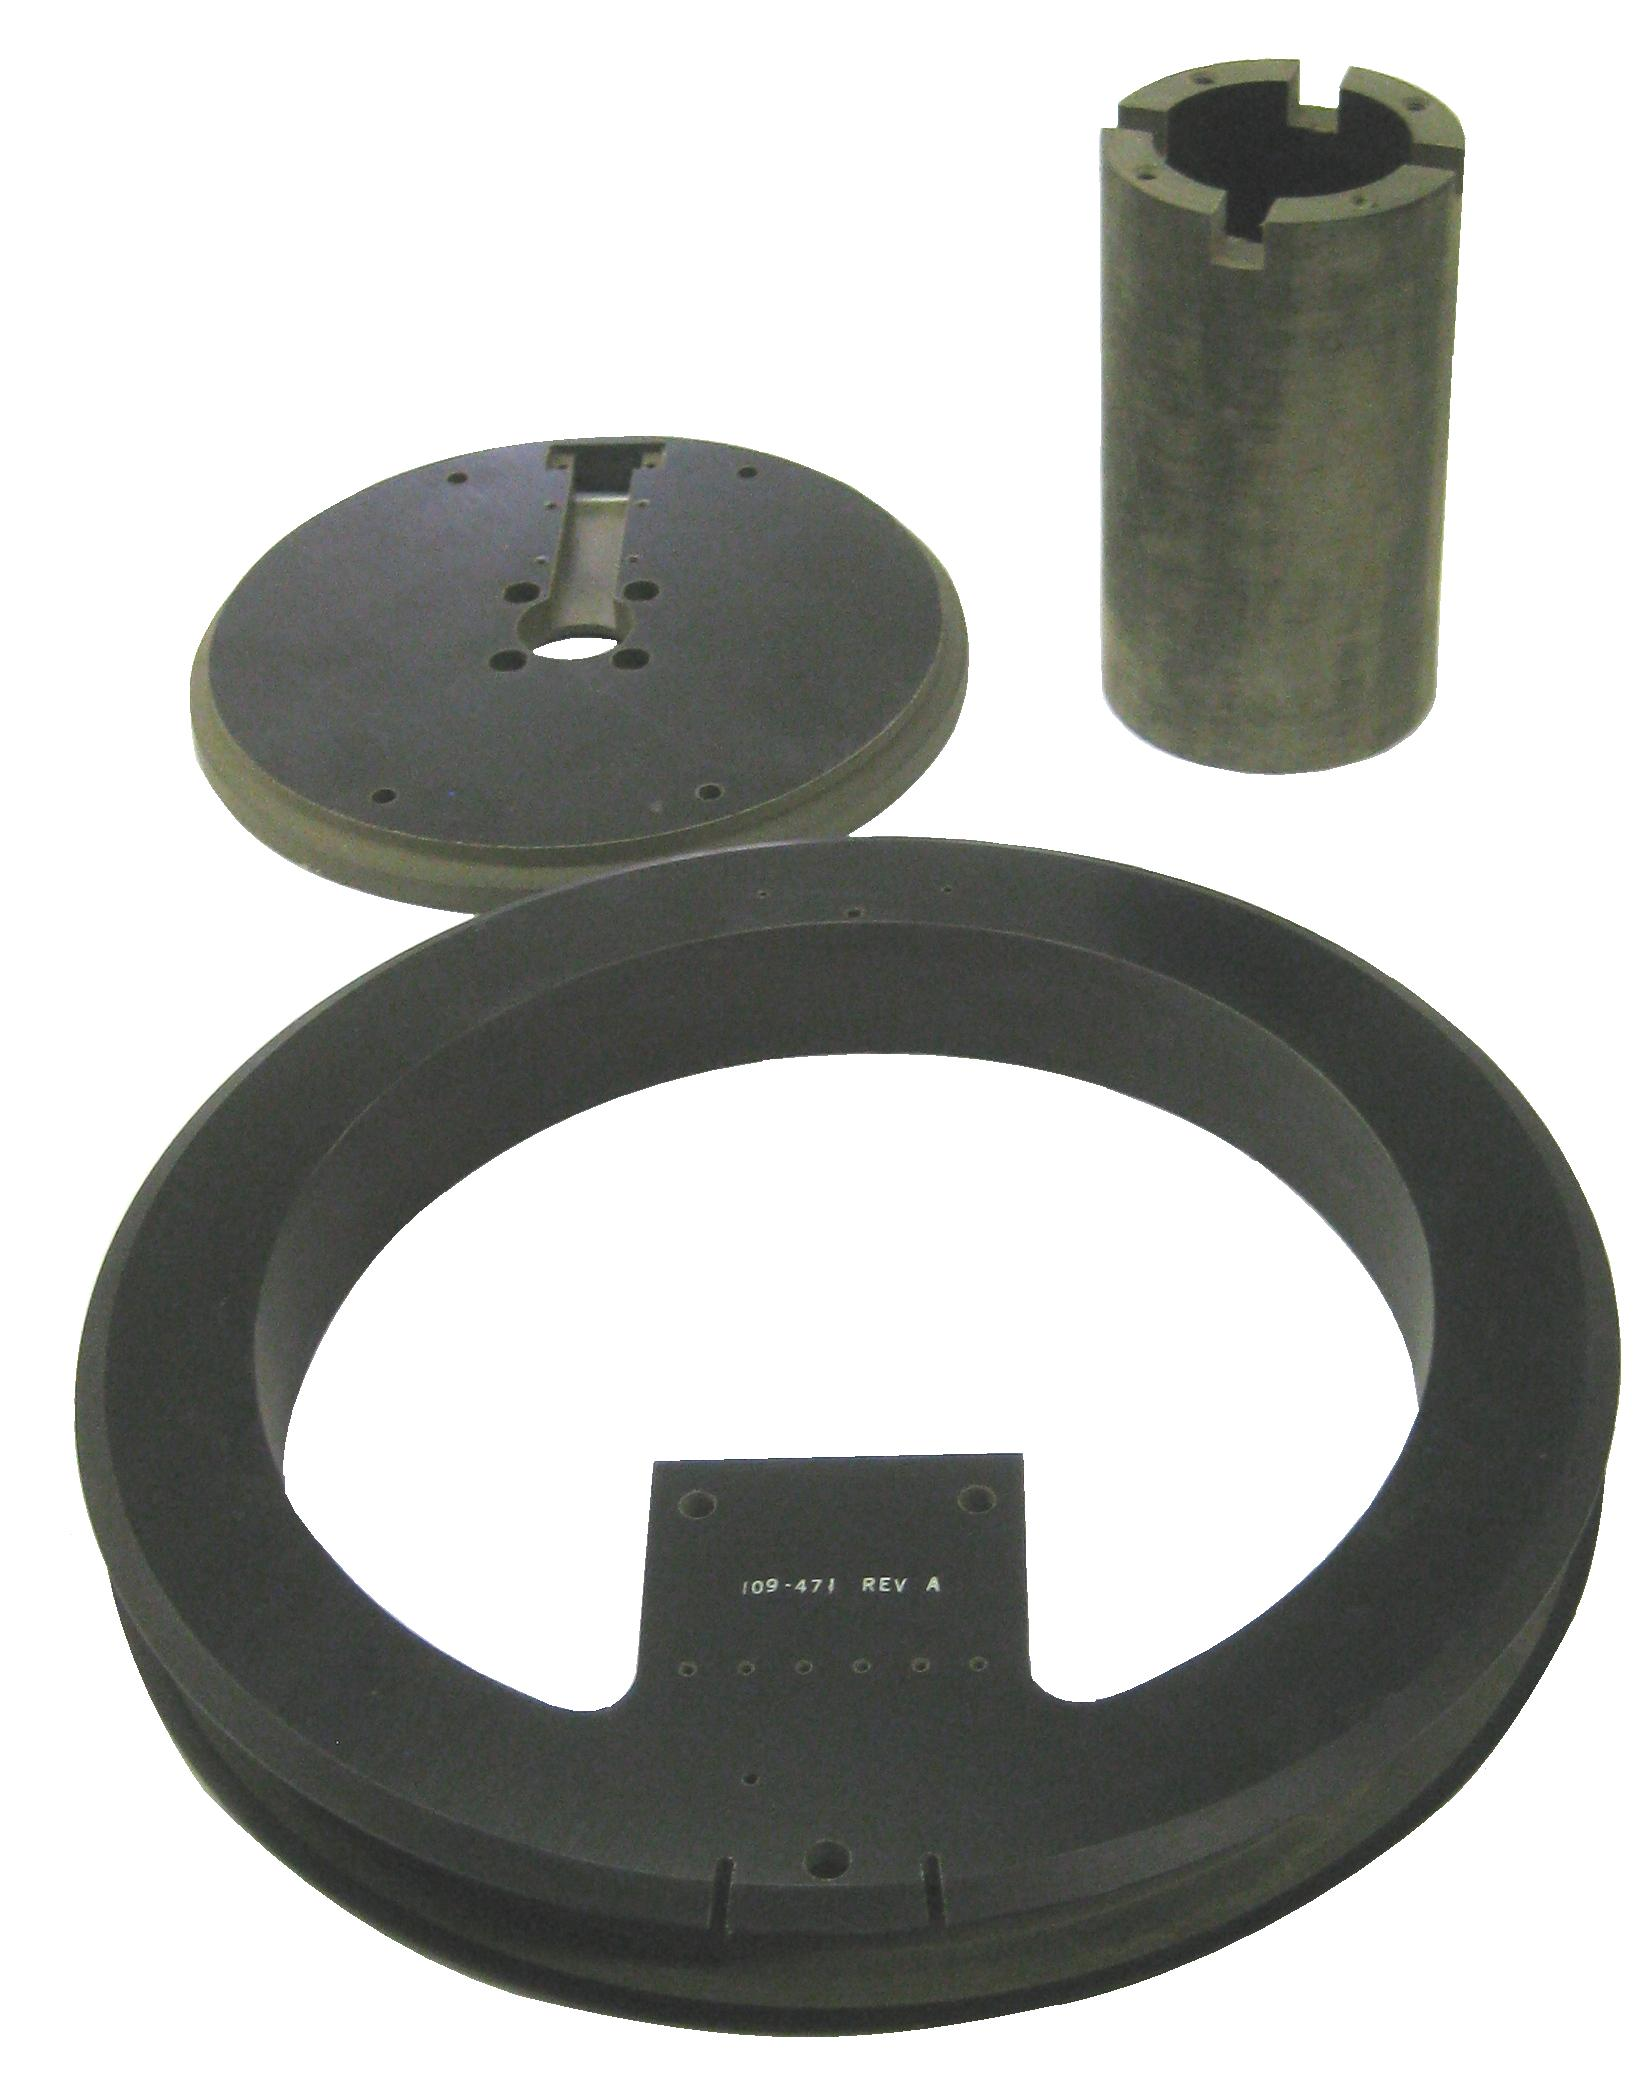 HRDC-Aerospace-Phenolic-Parts-IMG_2371.jpg